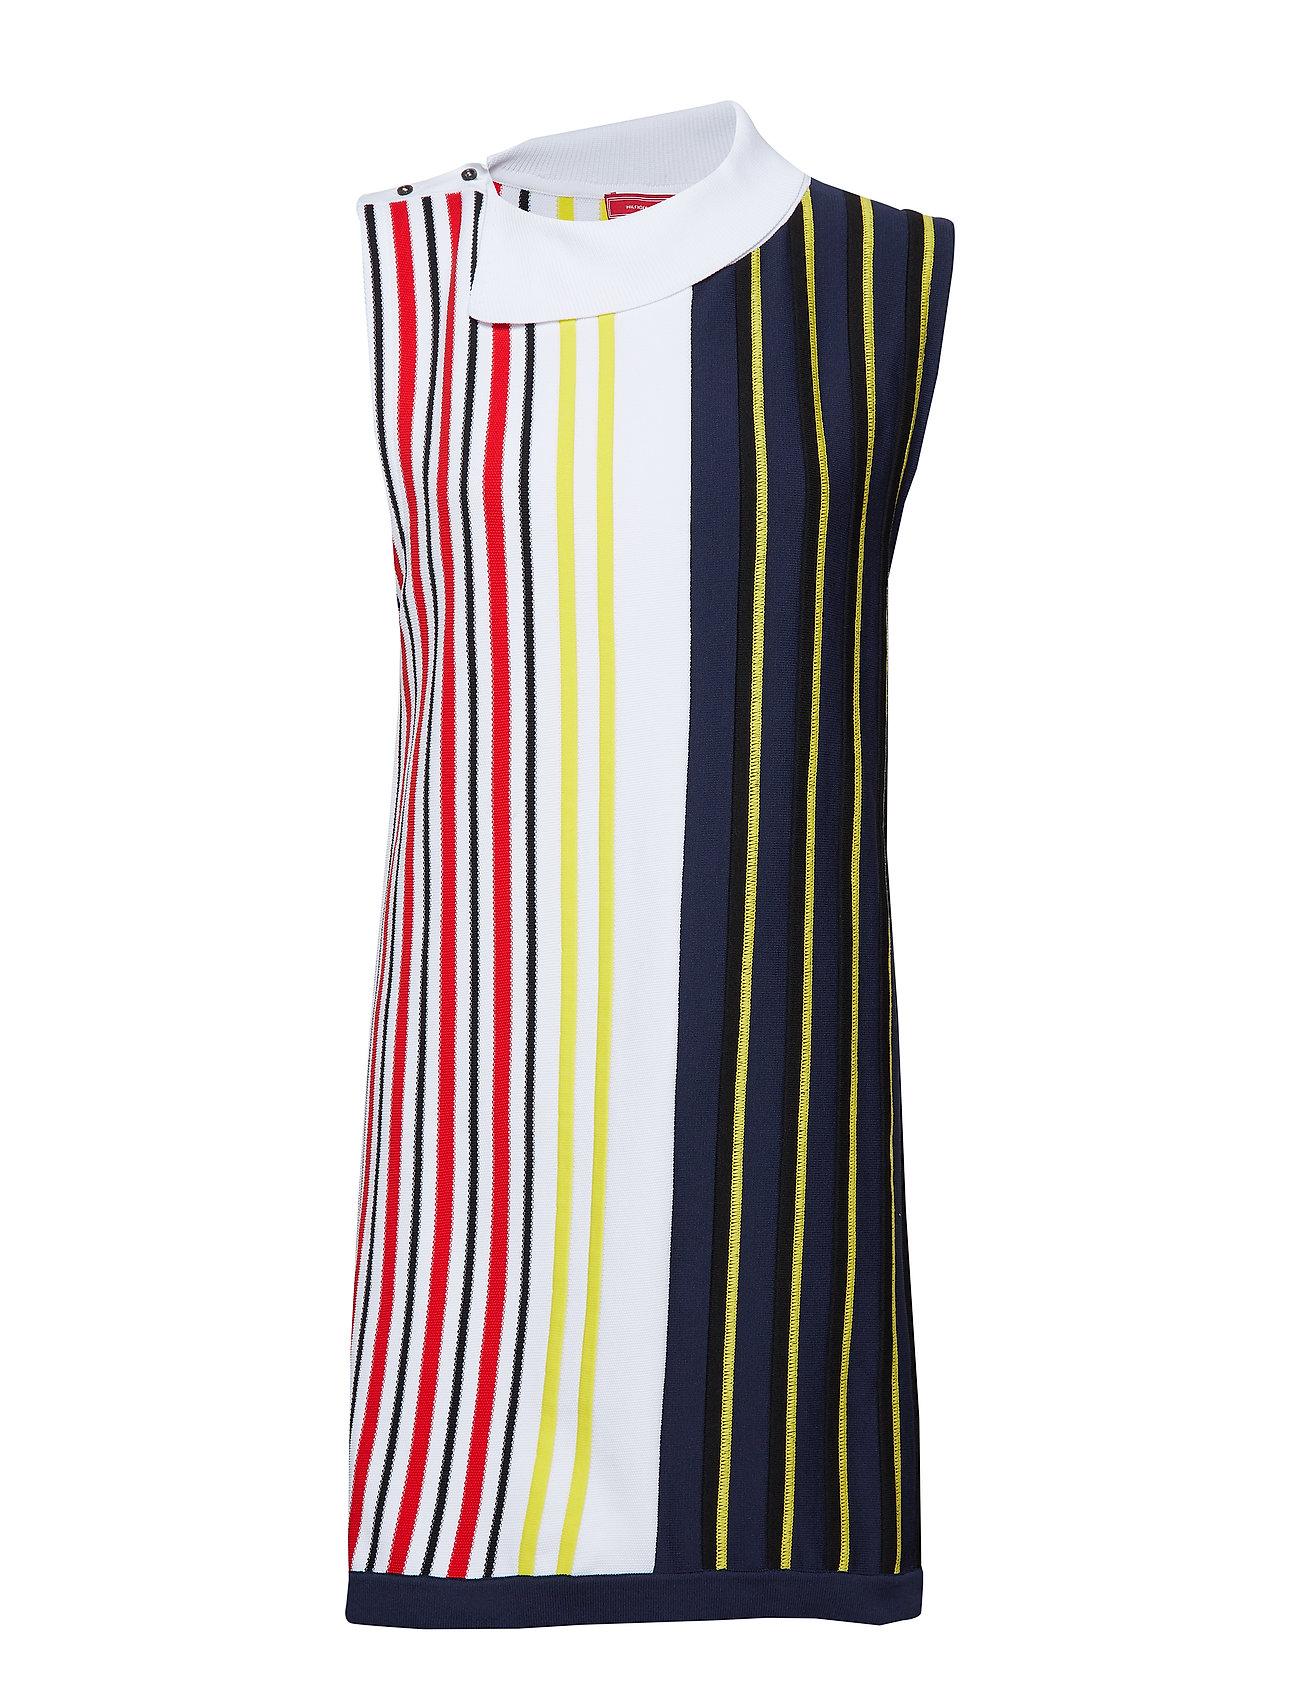 Hilfiger Collection STRIPED SWTR DRESS, - BRIGHT WHITE MULTI